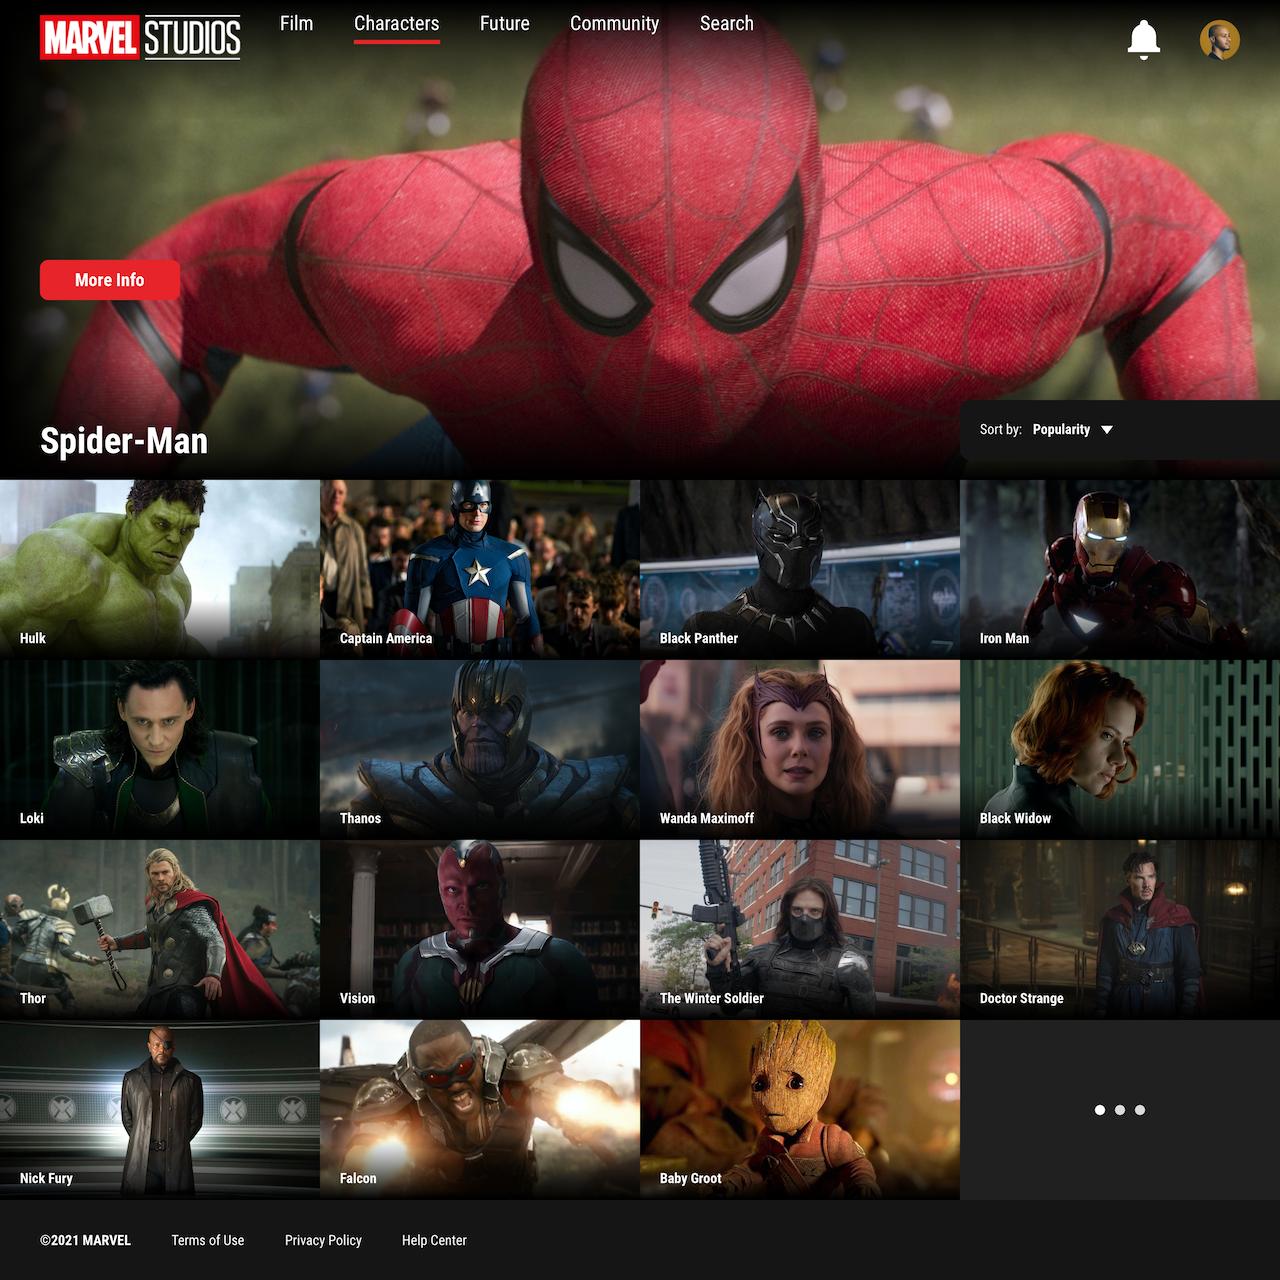 Marvel Studios streaming app project thumbnail